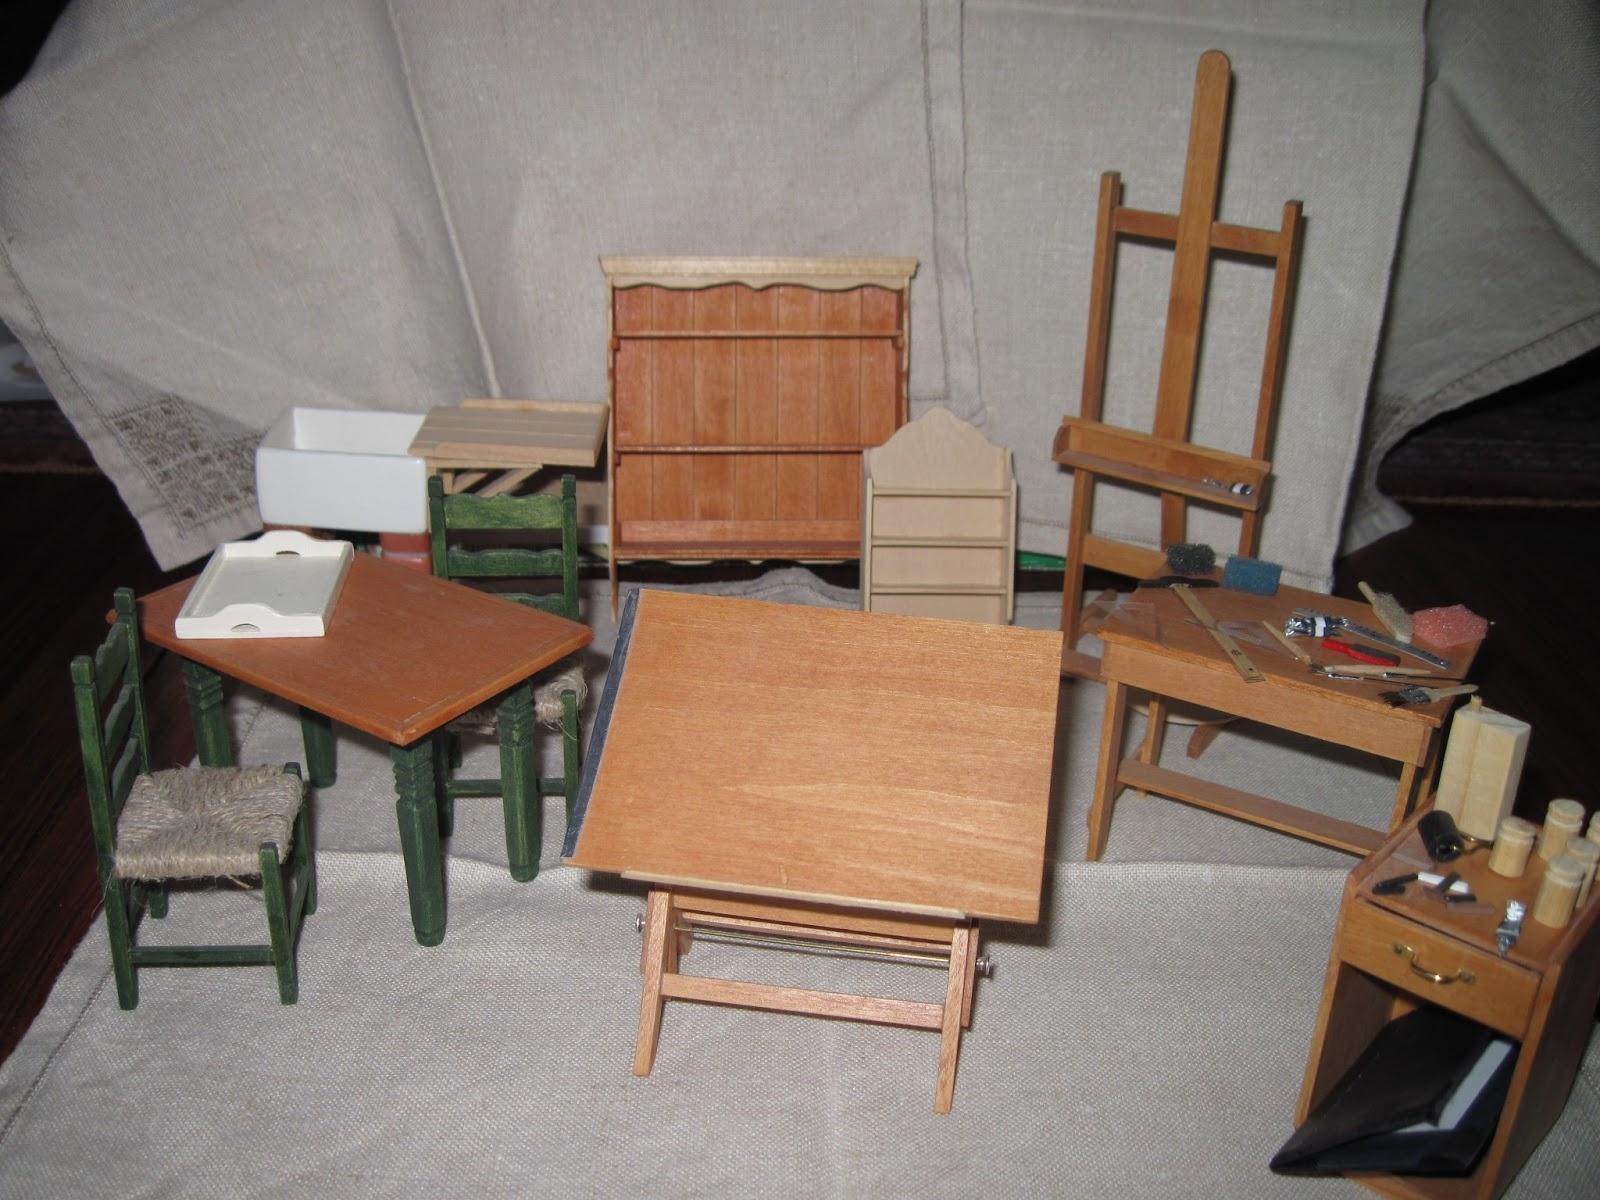 Home art studio furniture trend home design and decor - Home art studio furniture ...